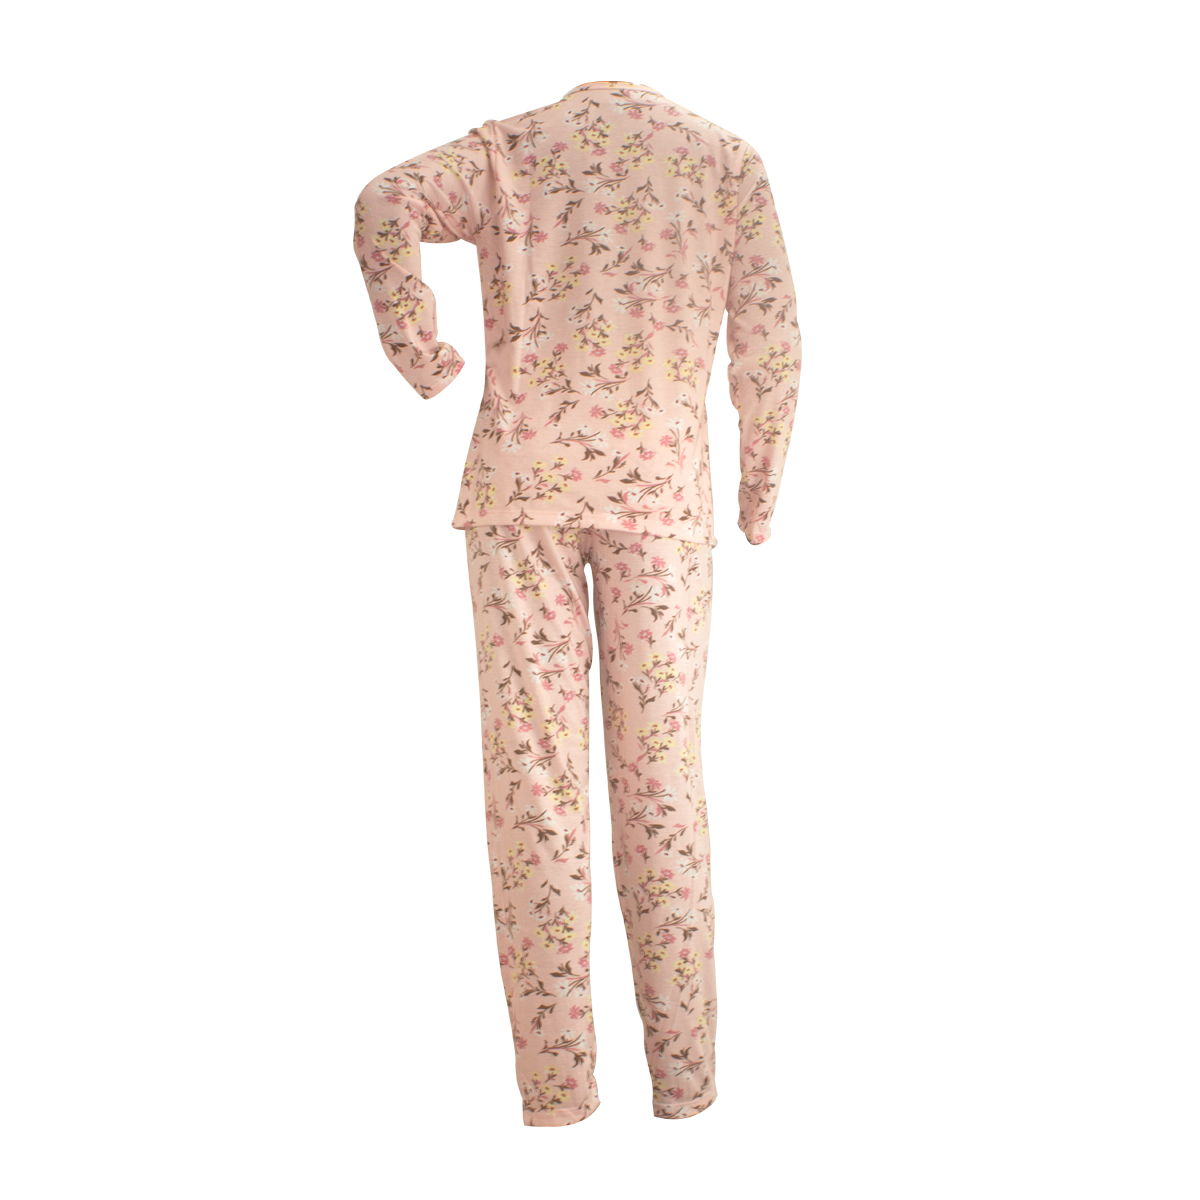 Pijama Floral  Longo Aberto Feminino Mardelle